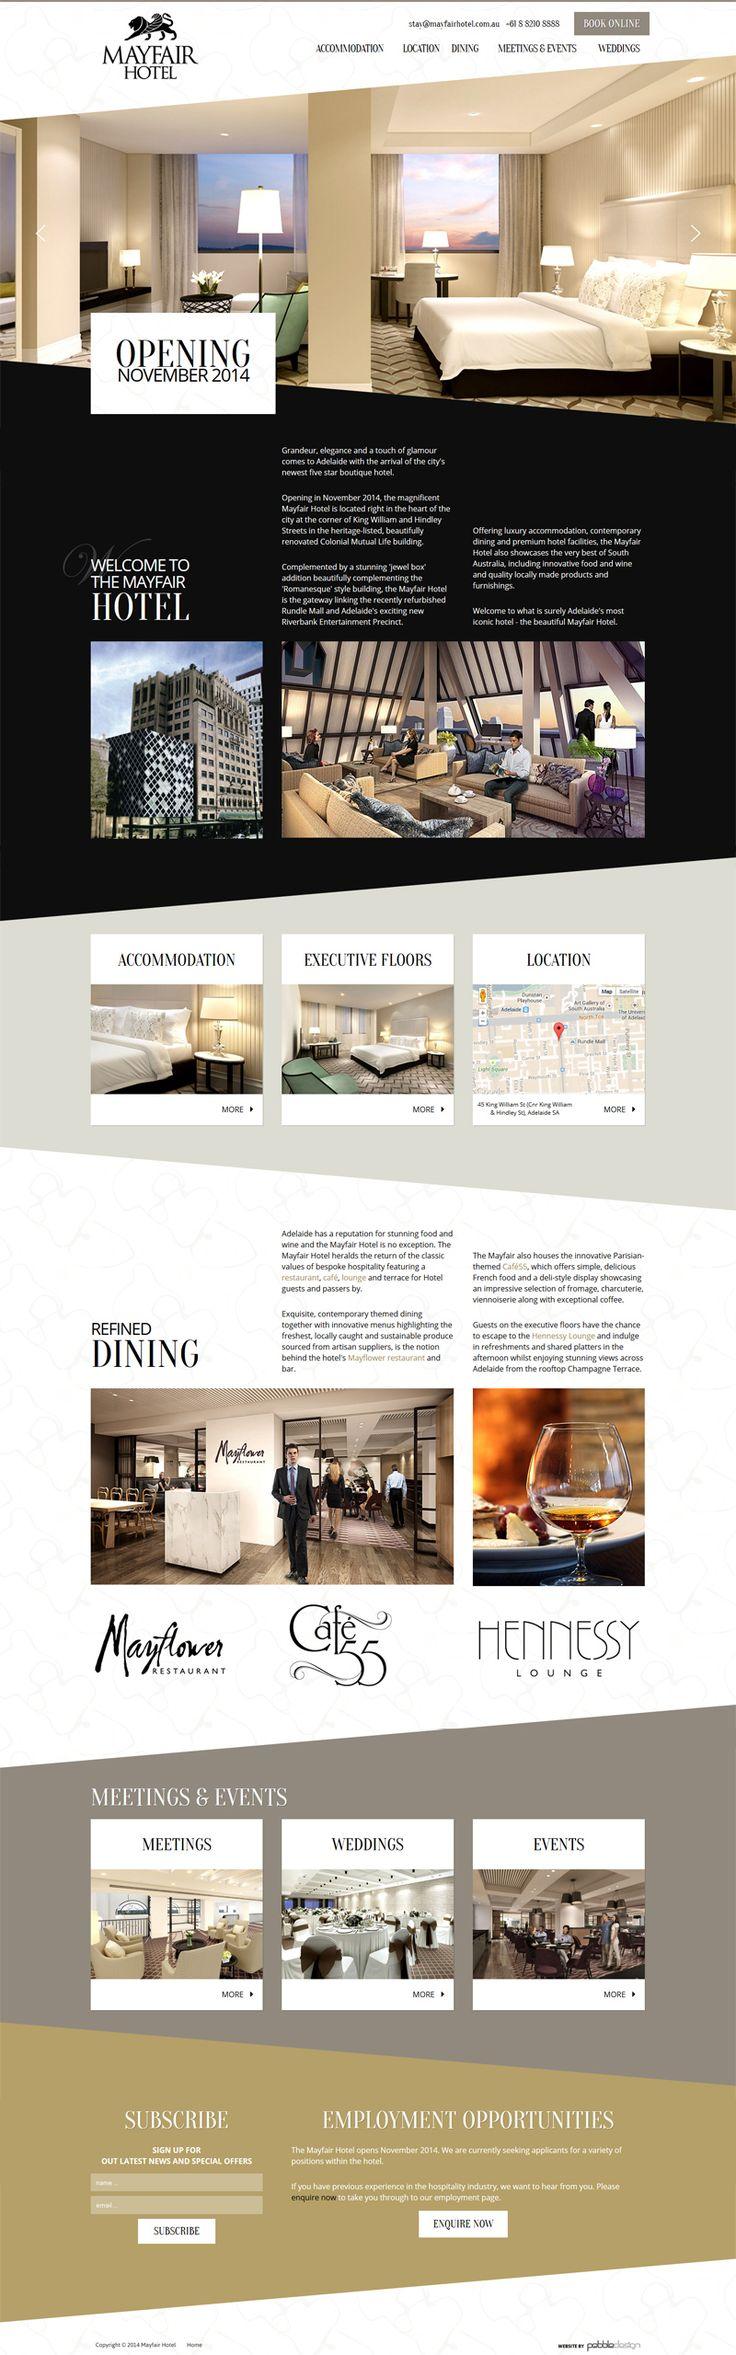 Room Design Website best 25+ hotel website ideas on pinterest | web design uk, host